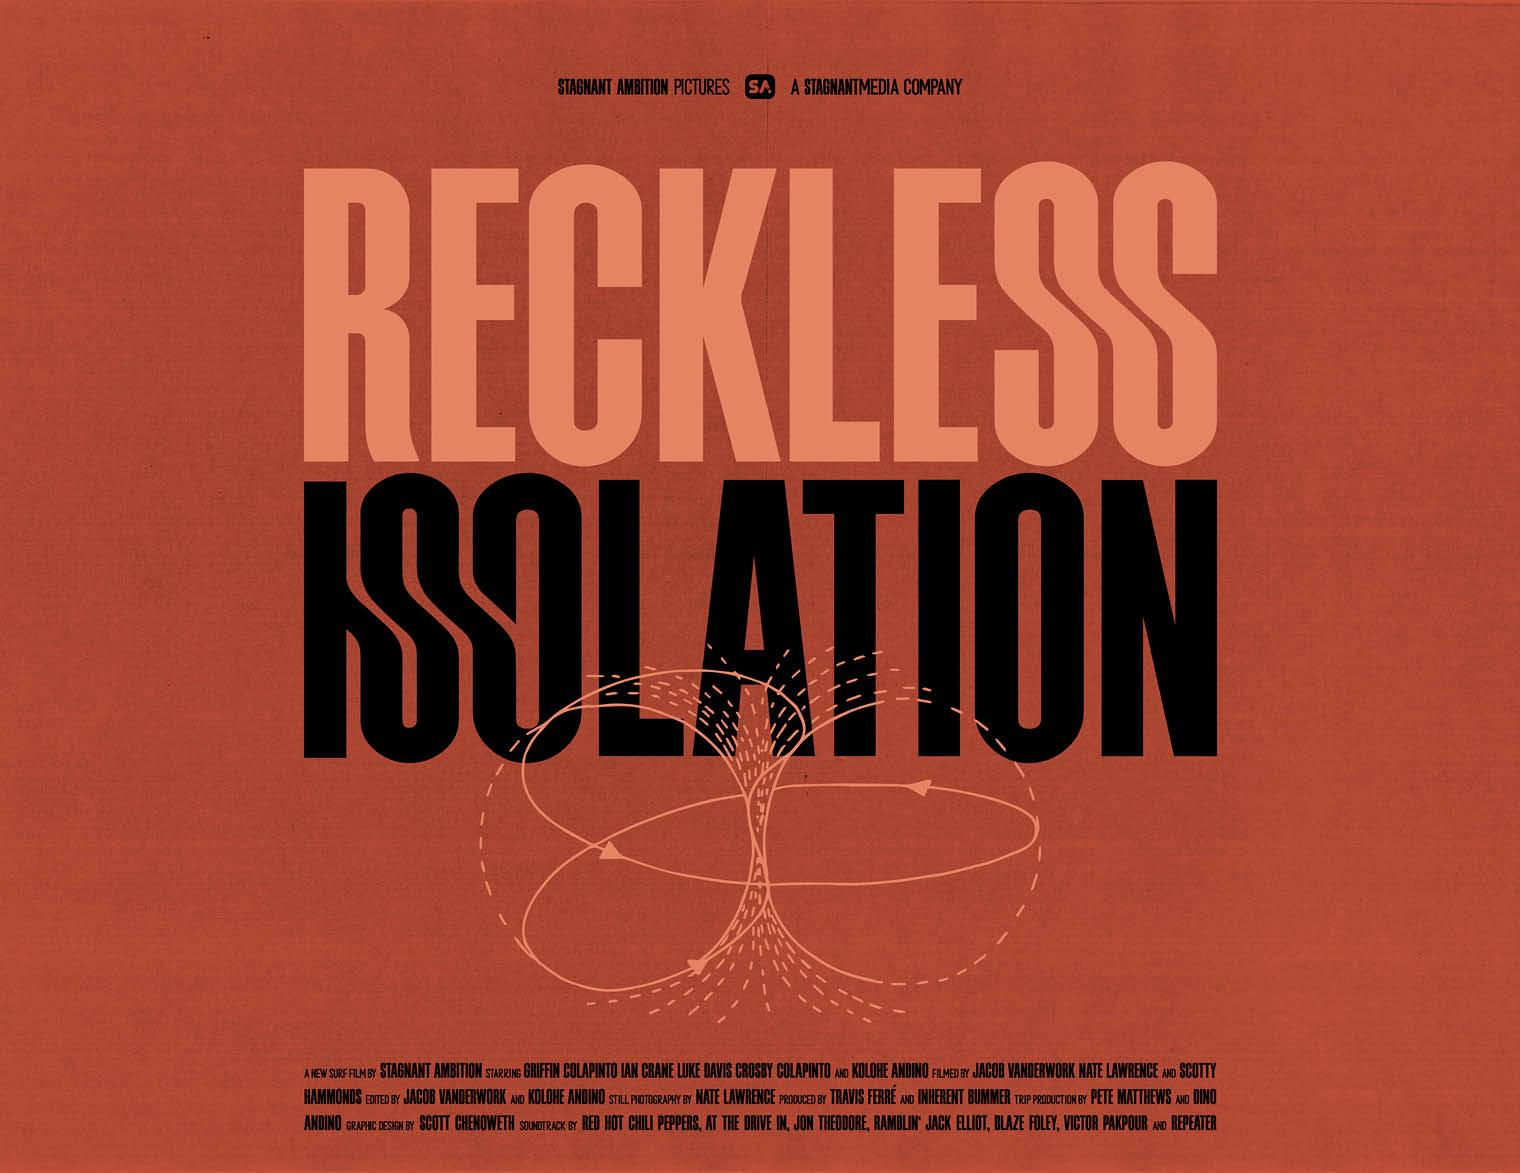 'RECKLESS ISOLATION' STARRING IAN CRANE